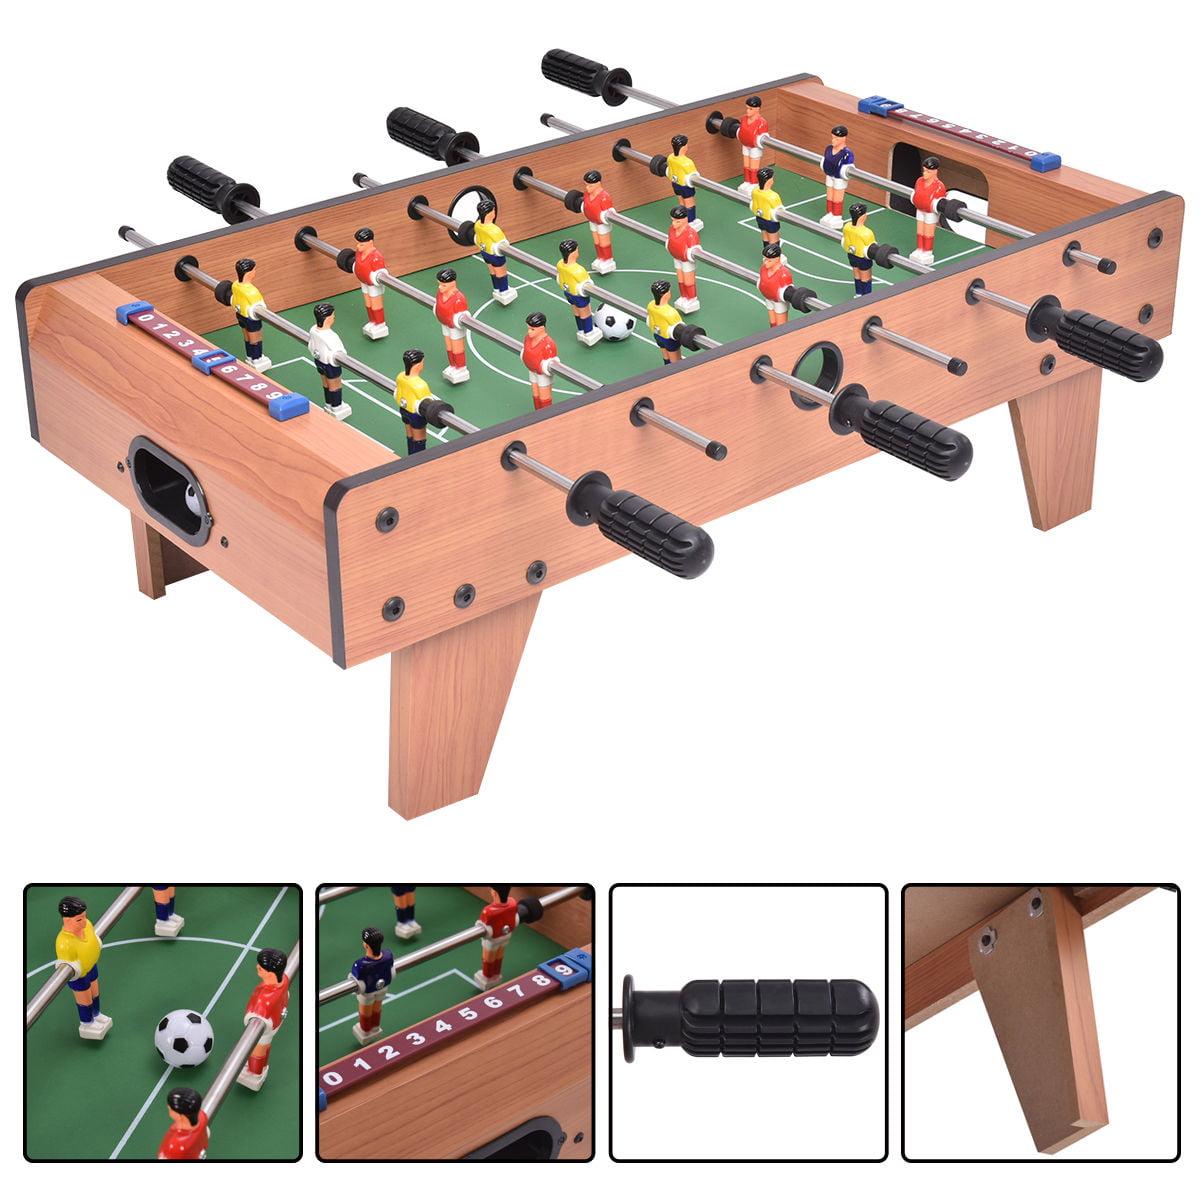 "GHP 27""x15""x9"" MDF Frame 6 Steel Rods Kids Tabletop Foosball Soccer Game... by"